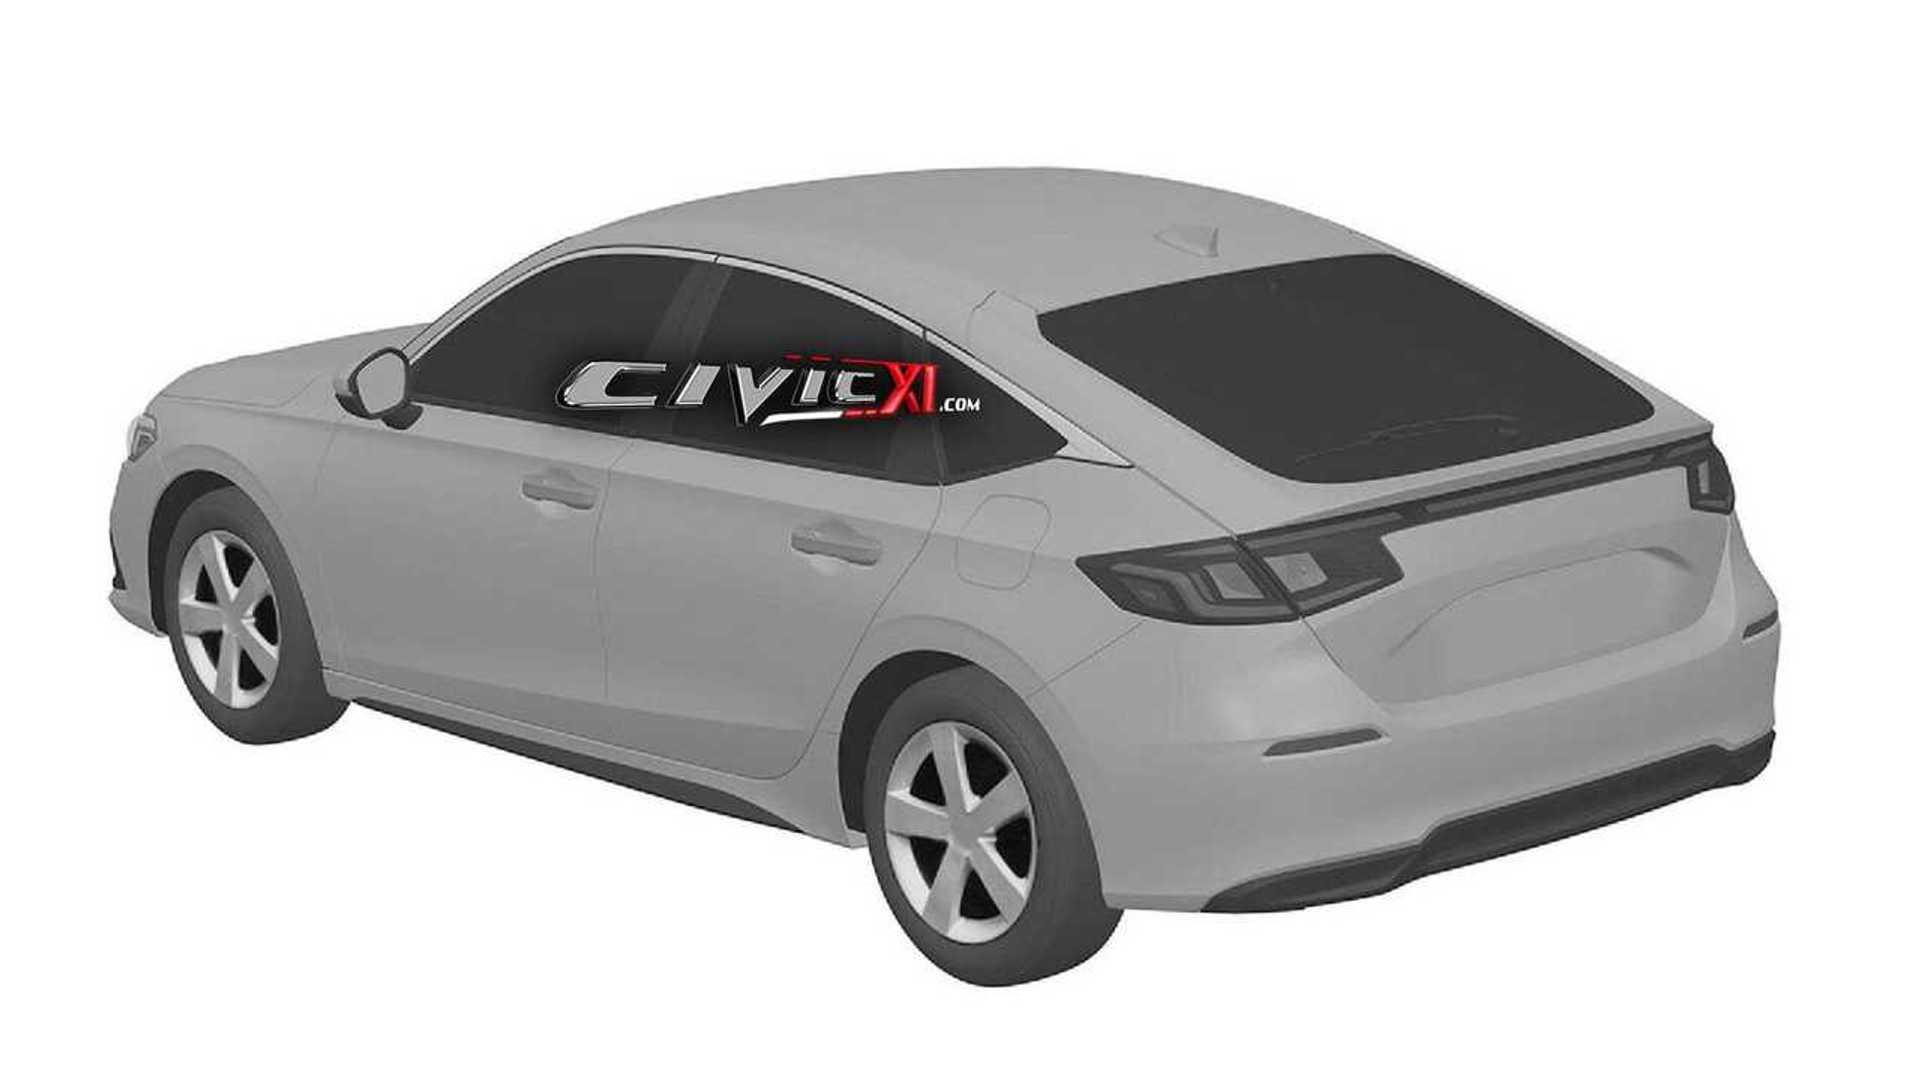 honda-civic-11th-generation-design-trademark-rear-three-quarters